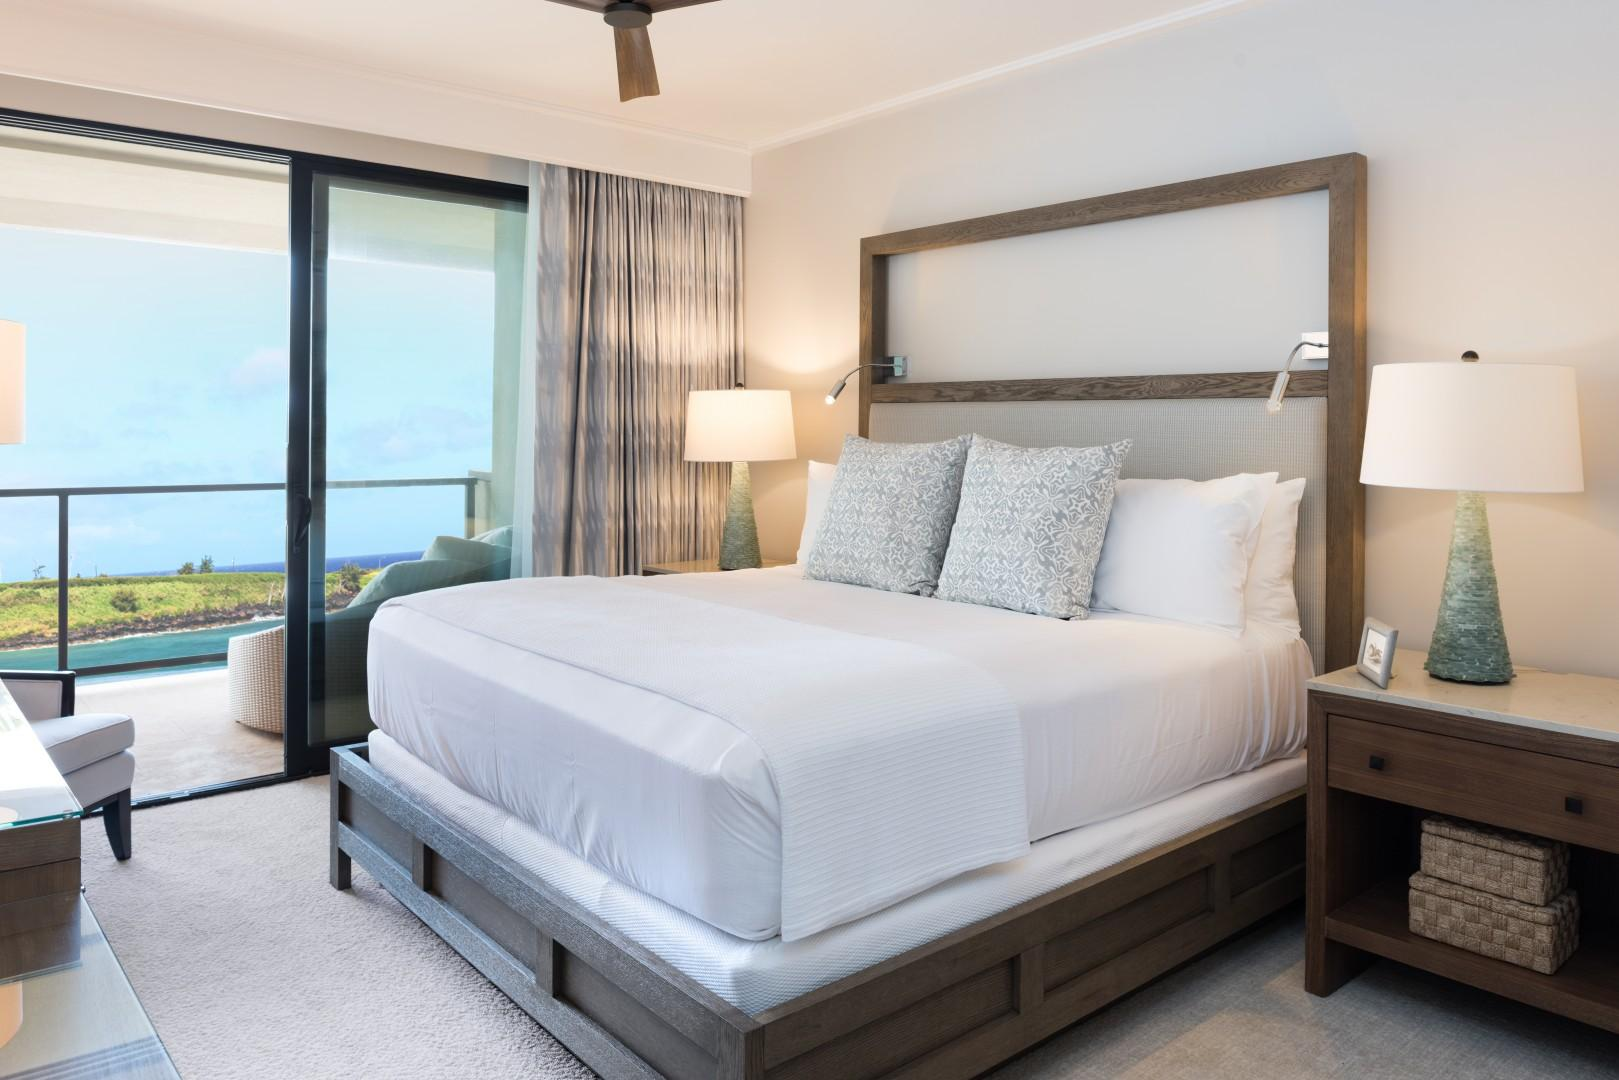 Spacious, luxurious bedrooms feature stunning ocean views.